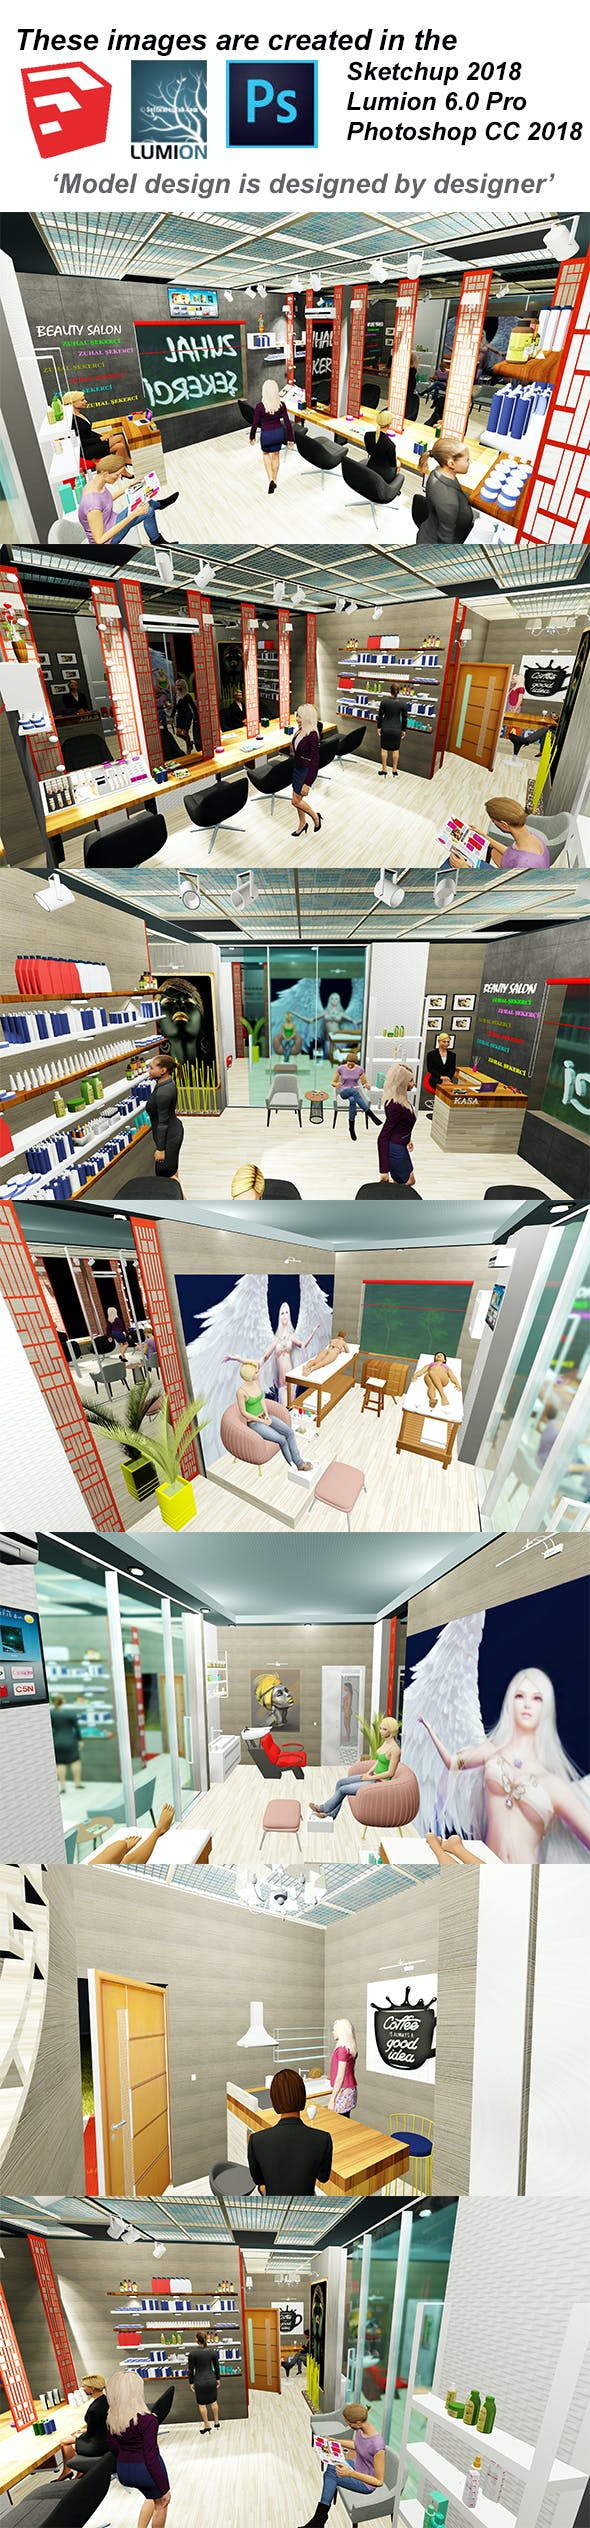 Beauty Salon Interior for Women - 3DOcean Item for Sale